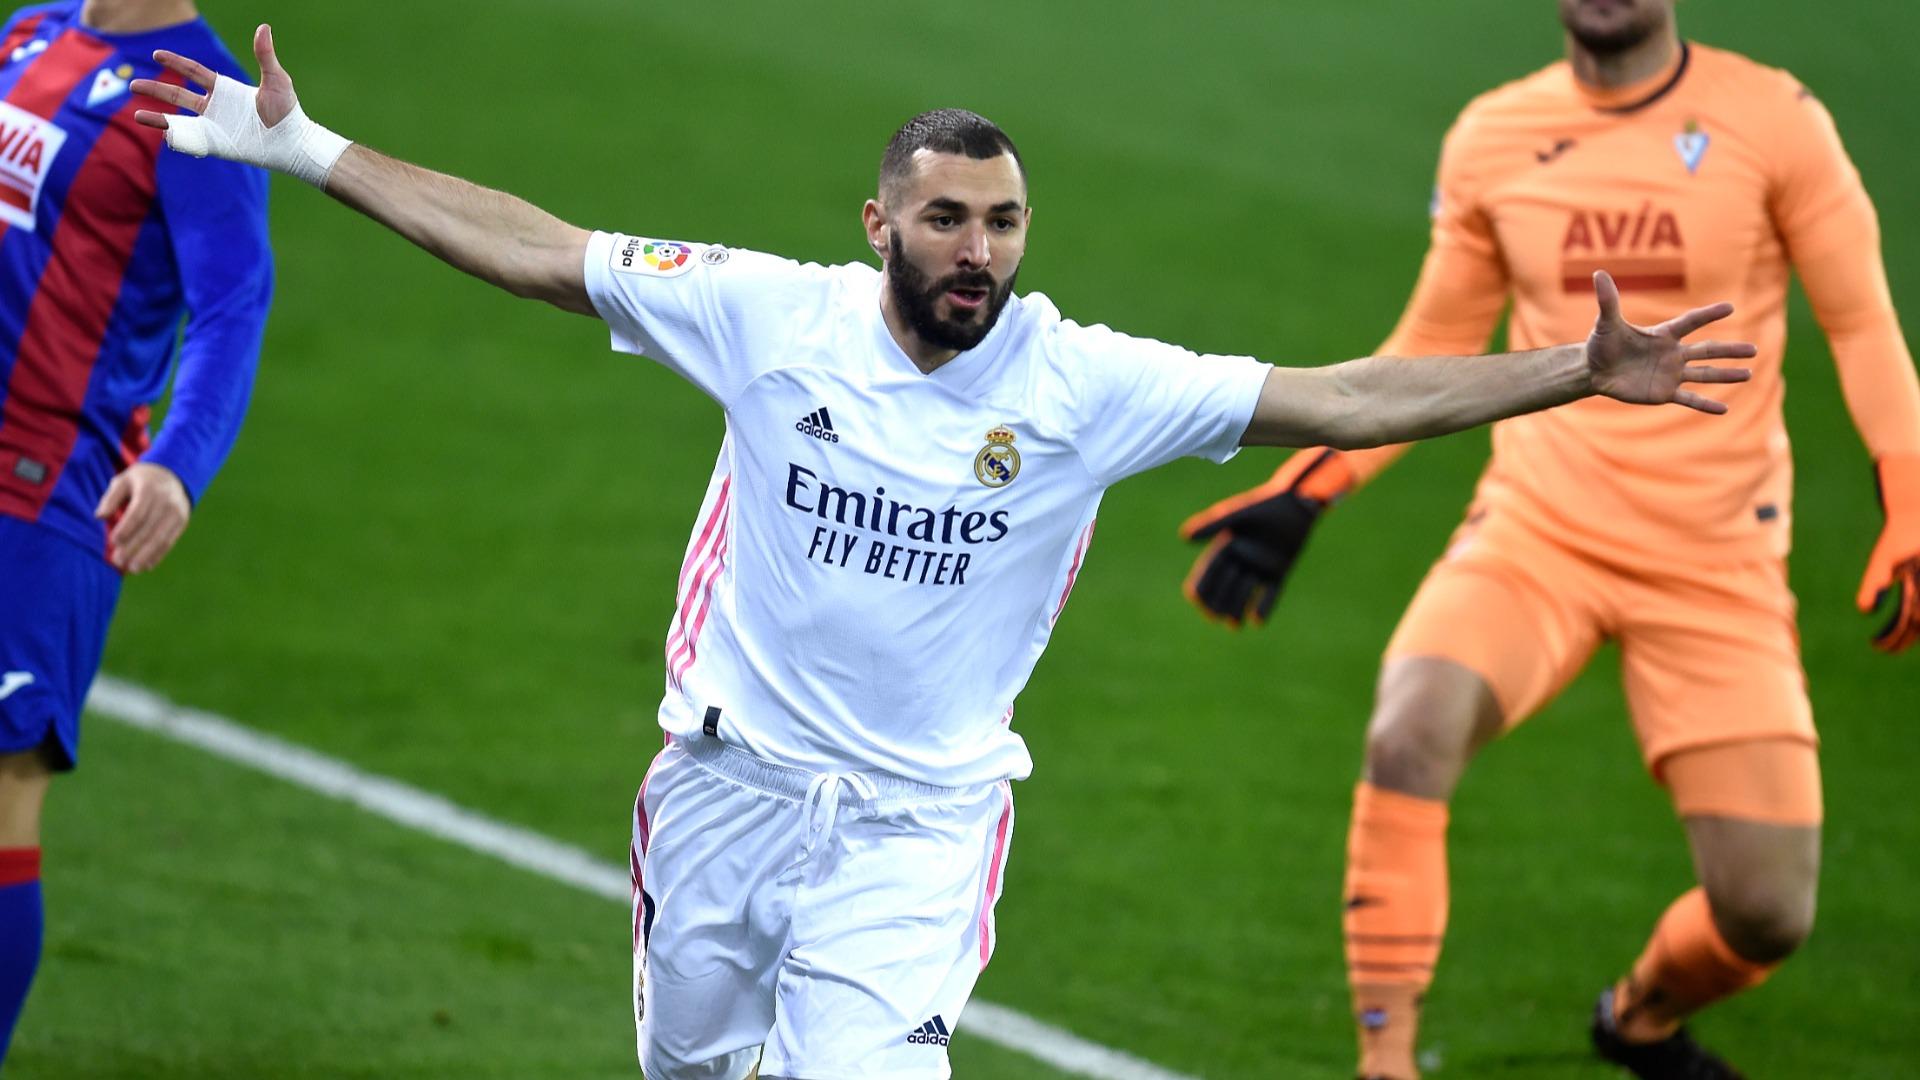 Eibar 1-3 Real Madrid: Benzema stars as Los Blancos go second